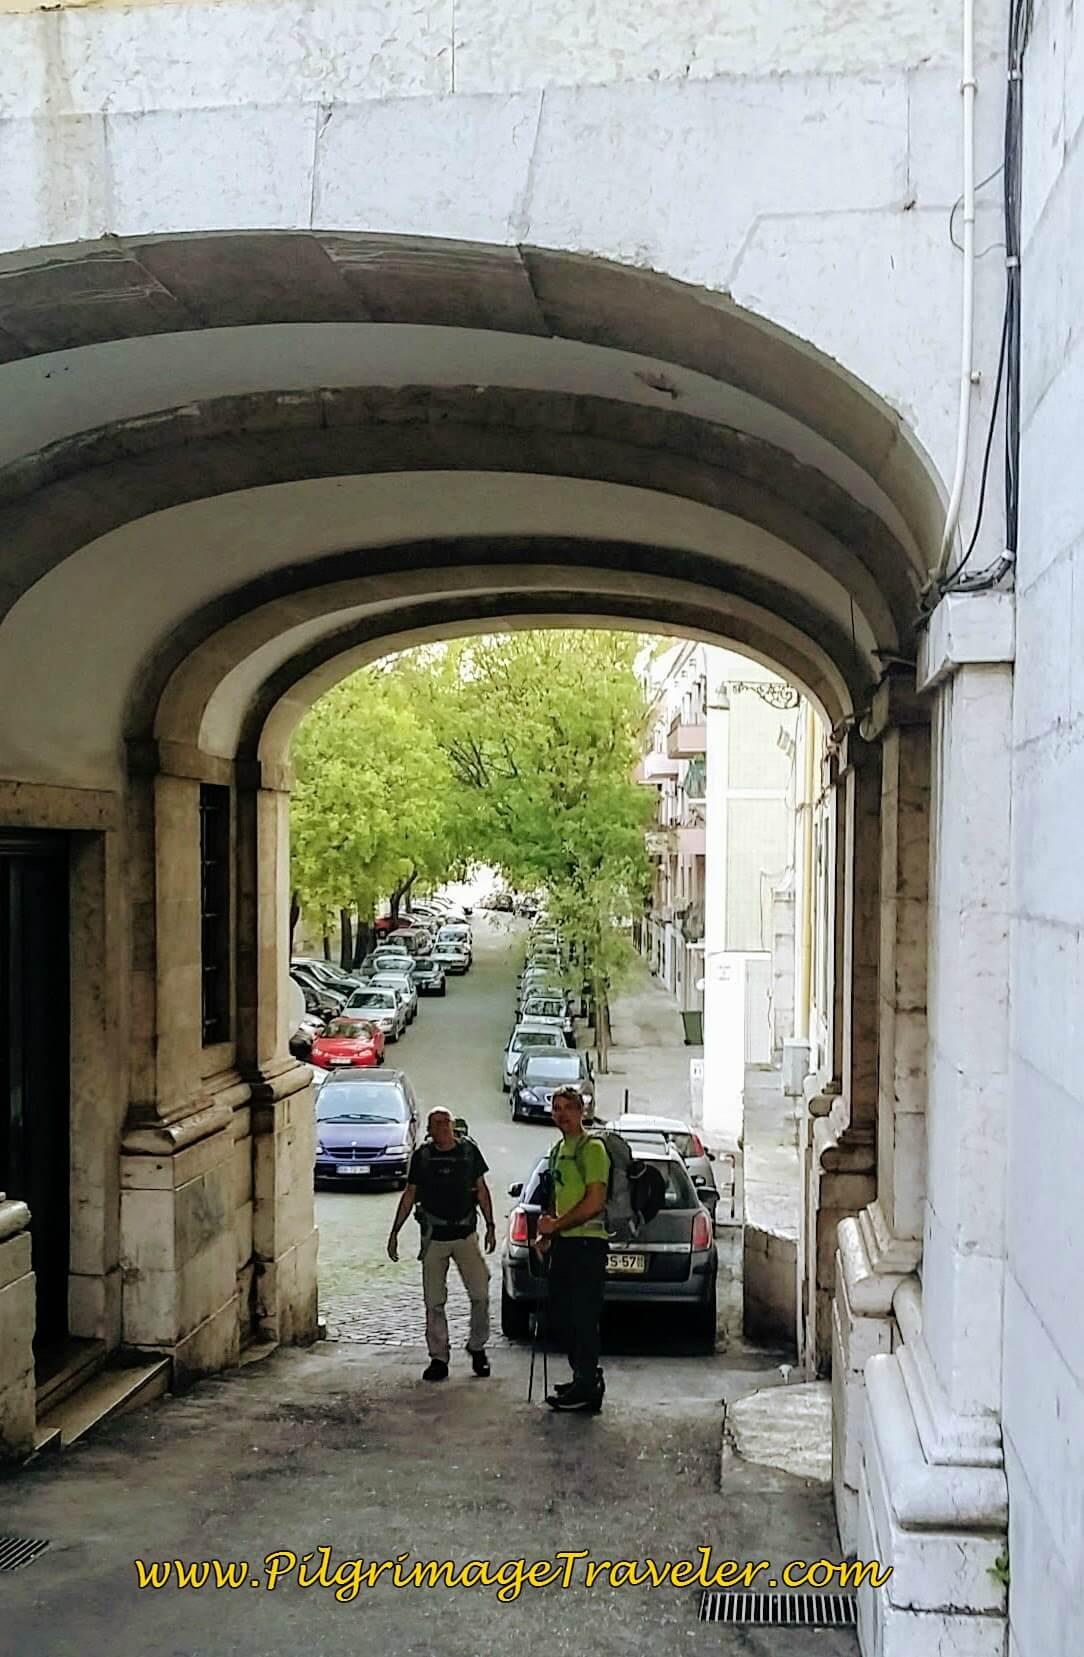 Archway along the Rua do Paraíso, Lisbon, Portugal